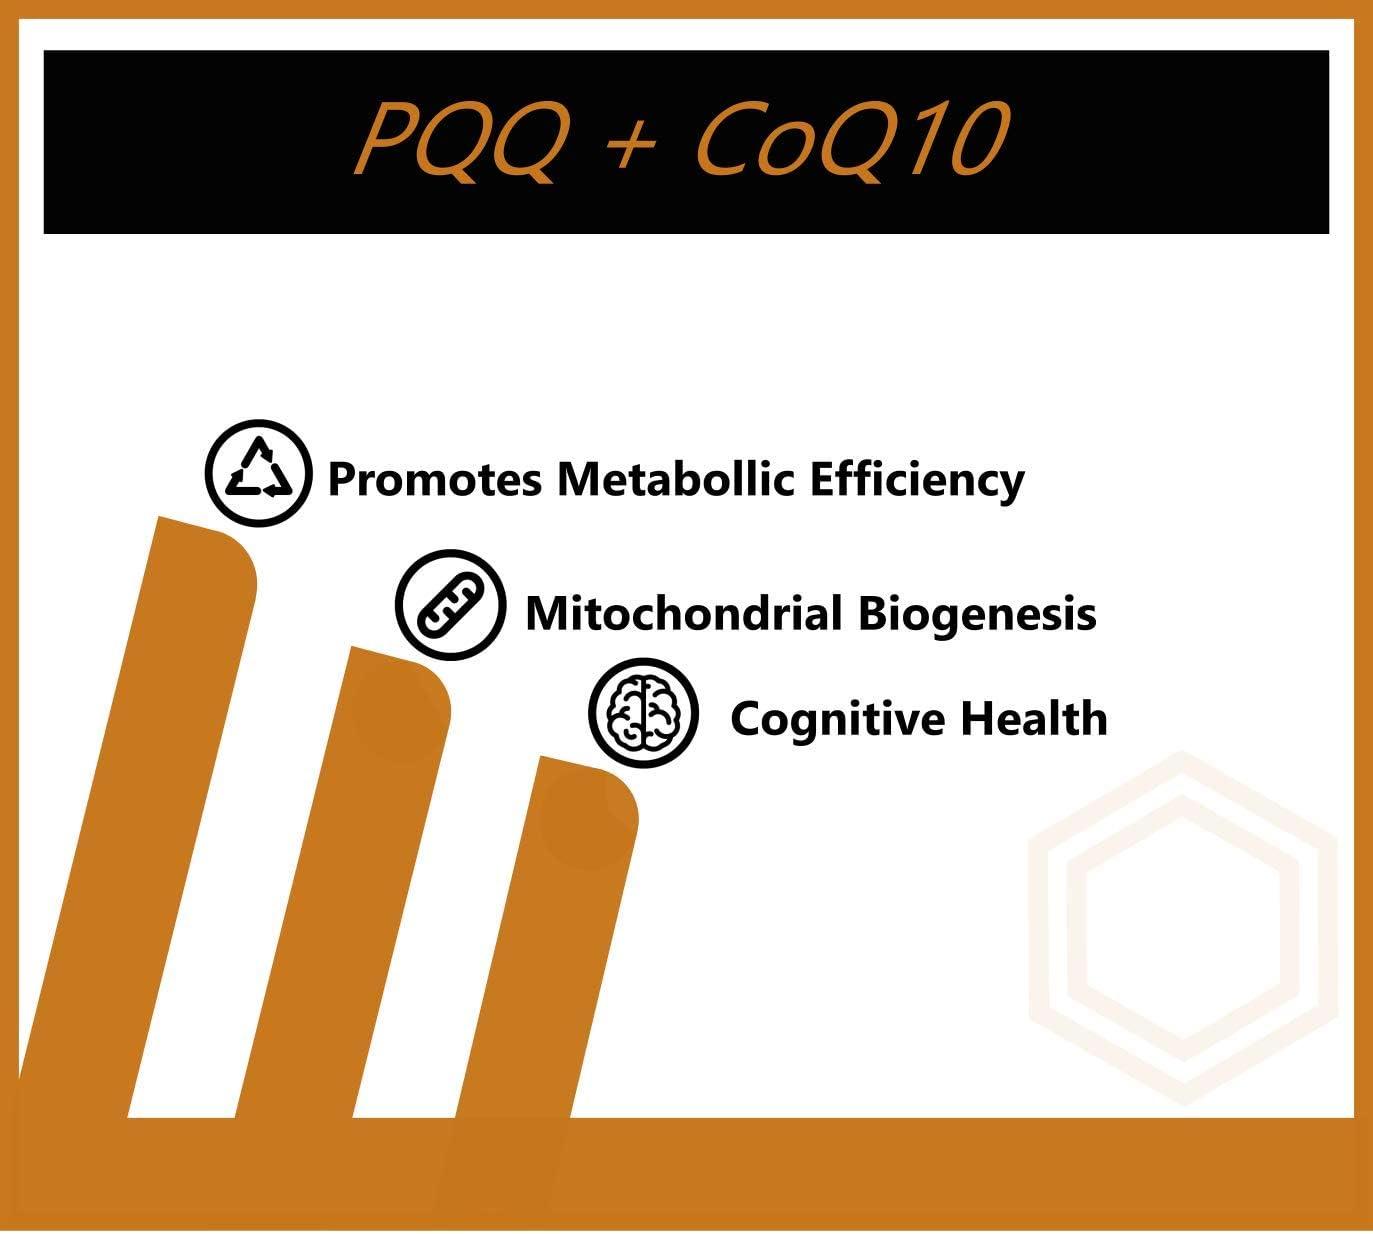 Flambeau Labs PQQ+CoQ10 | 30 Capsules, 200mg CoQ10, 20mg PQQ | Promotes Metabolic Efficiency, Mitochondrial Biogenesis, and Cognitive Health